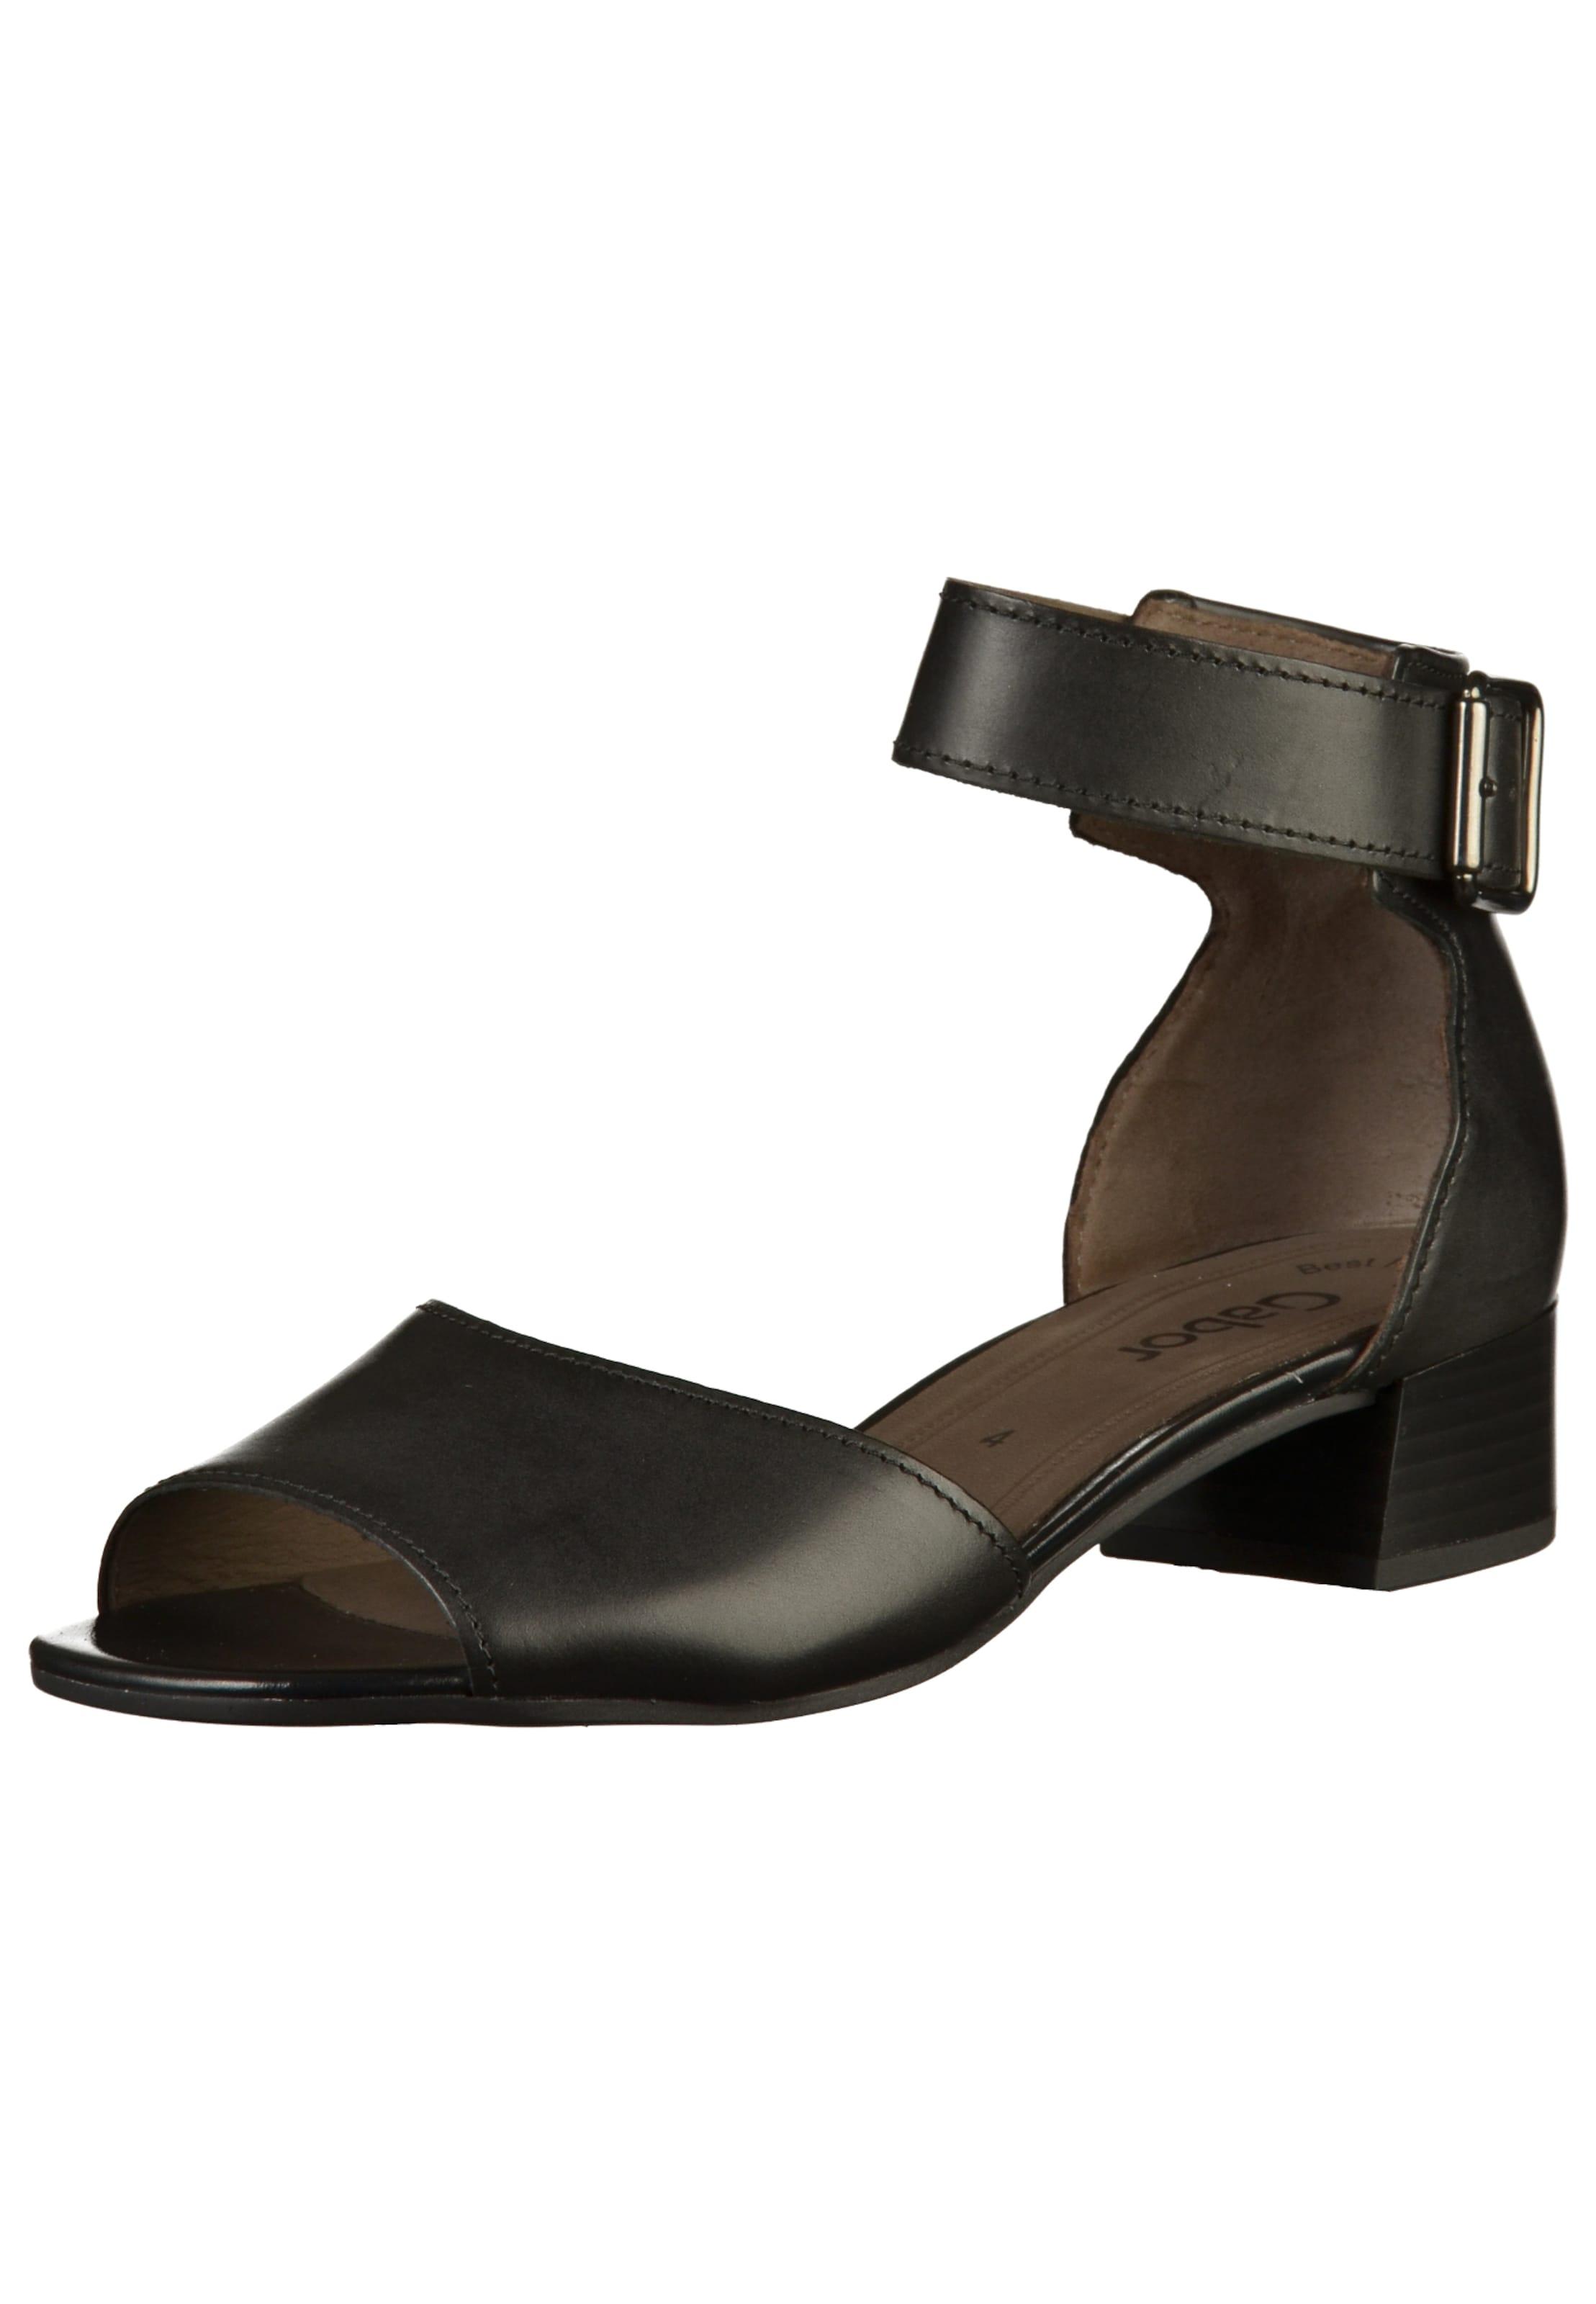 Haltbare Mode Sandalen billige Schuhe GABOR | Sandalen Mode Schuhe Gut getragene Schuhe e44688